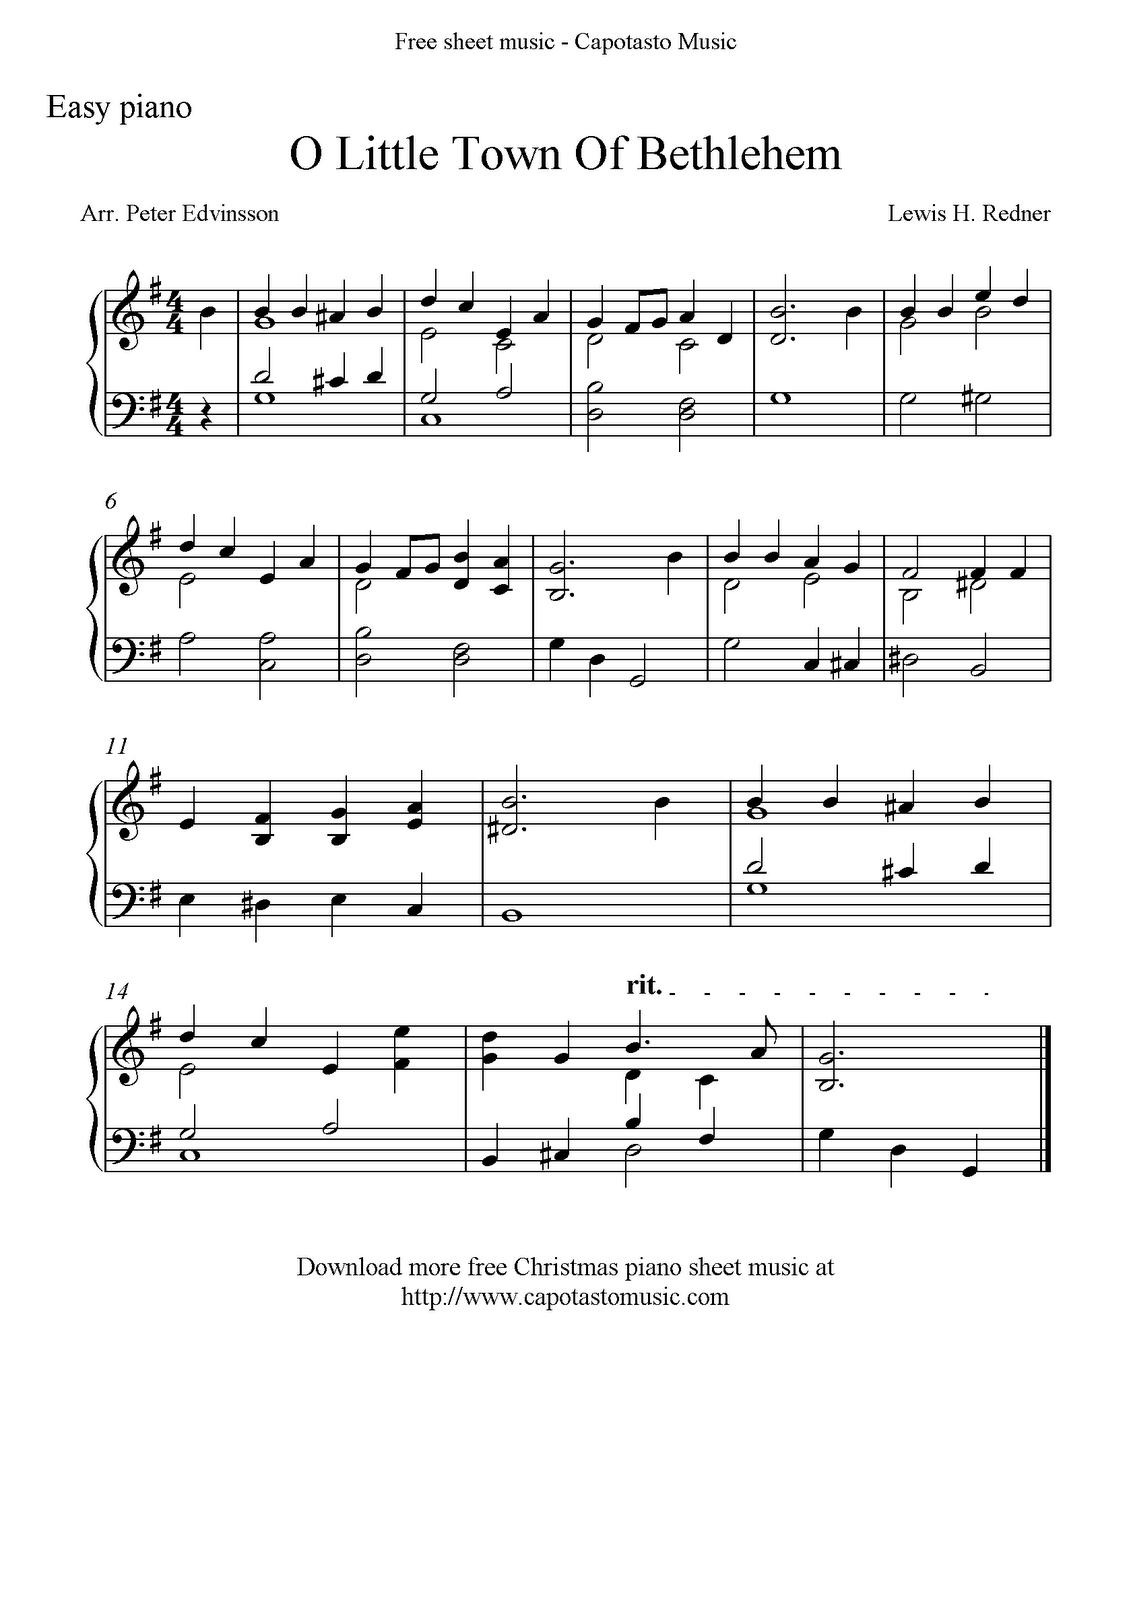 photo relating to Christmas Carols Sheet Music Free Printable referred to as Xmas Carols Sheet Tunes Free of charge Printable Free of charge Printable